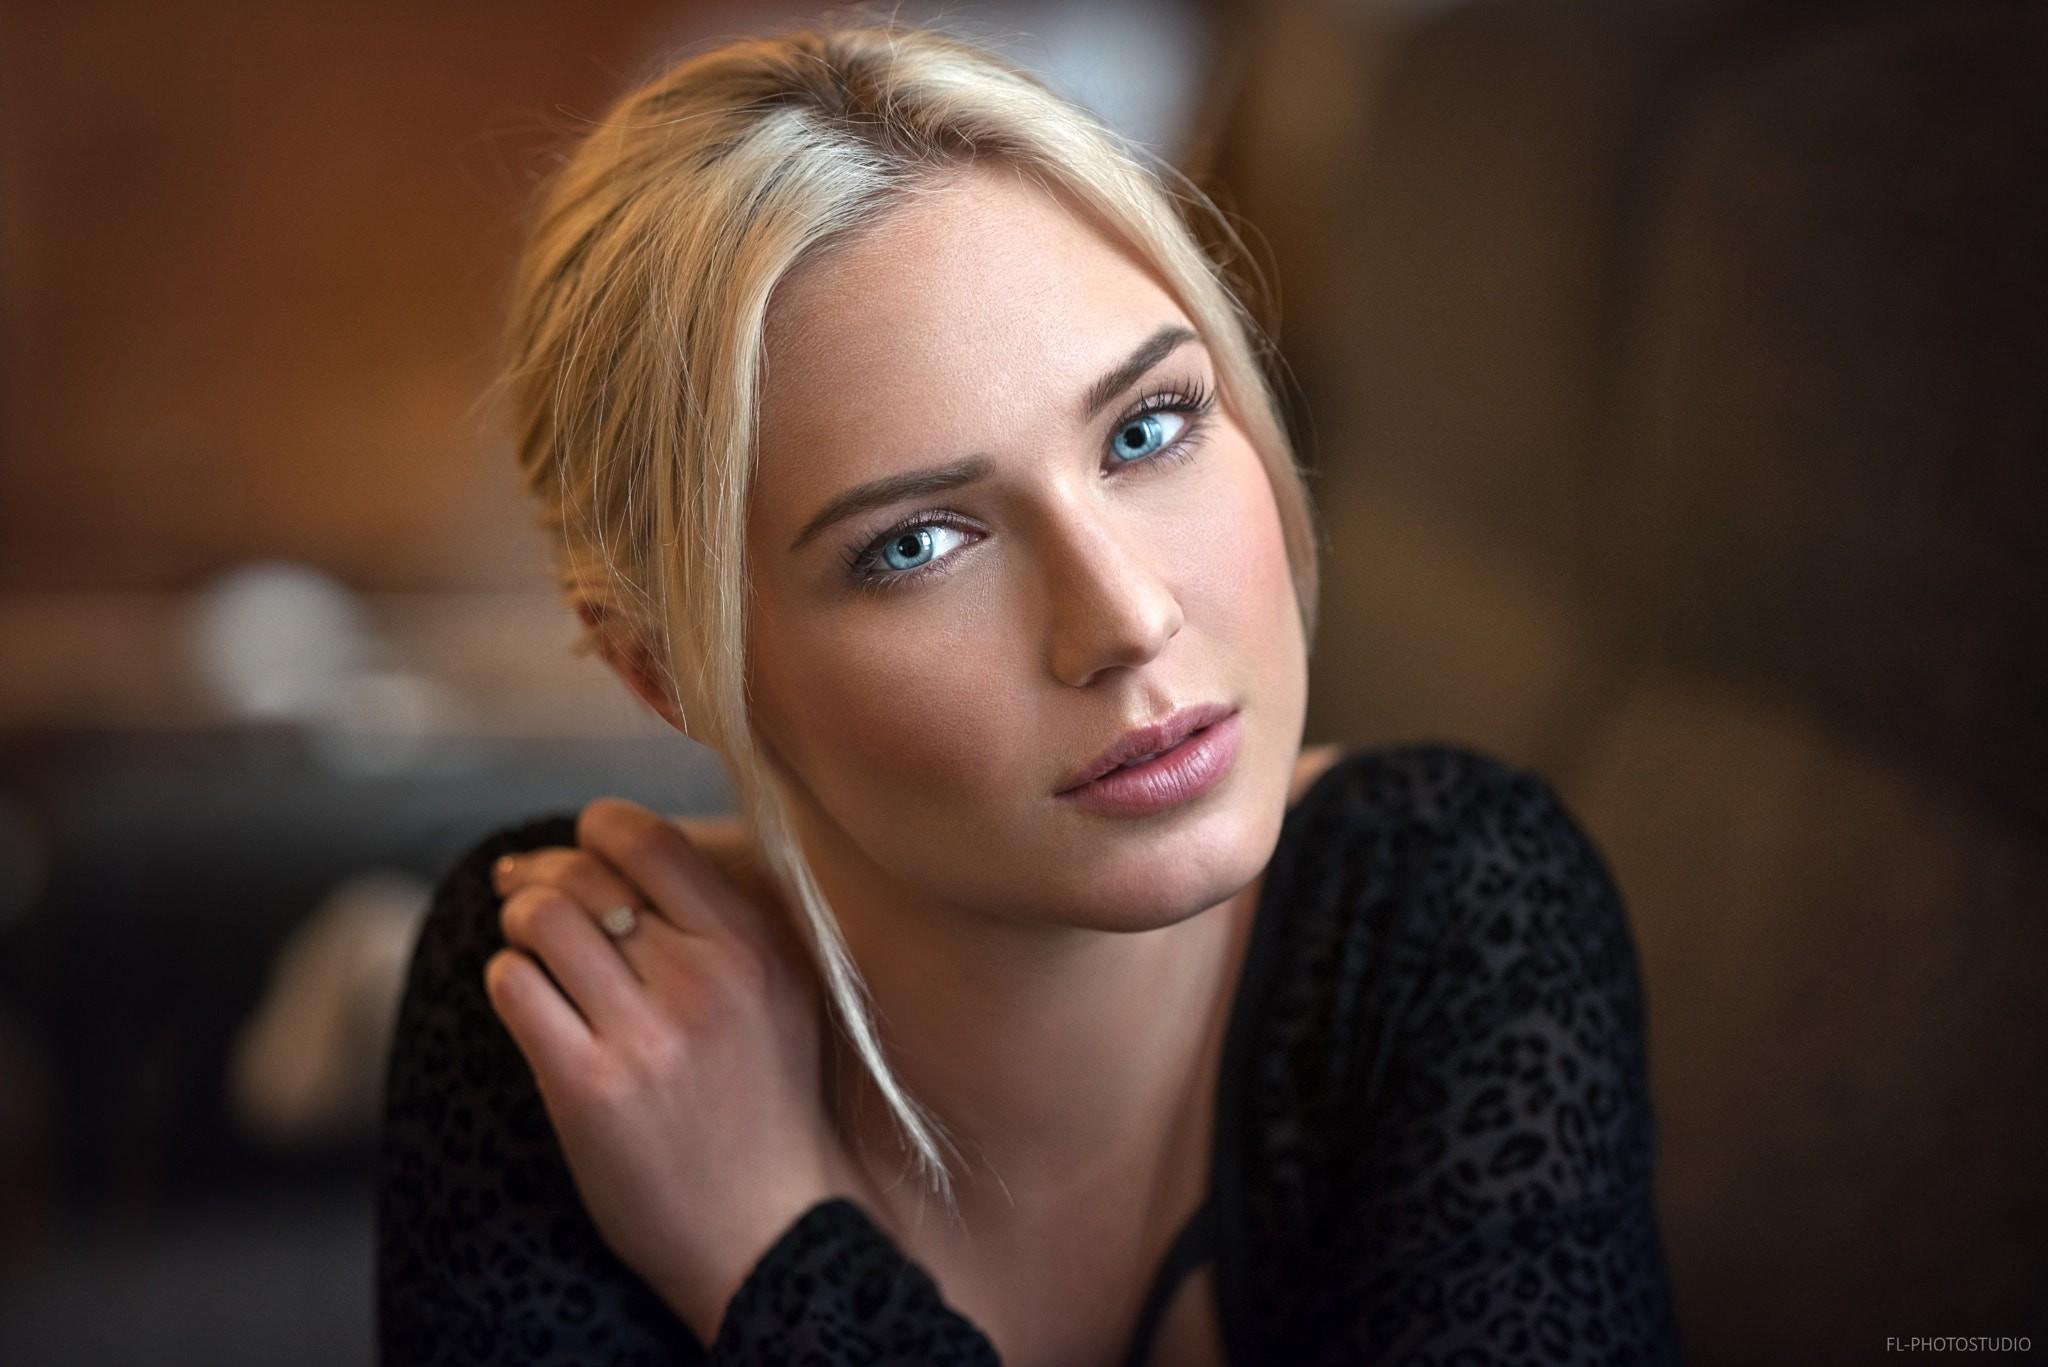 People 2048x1367 women blonde face blue eyes portrait depth of field natural light black clothing Lods Franck Eva Mikulski